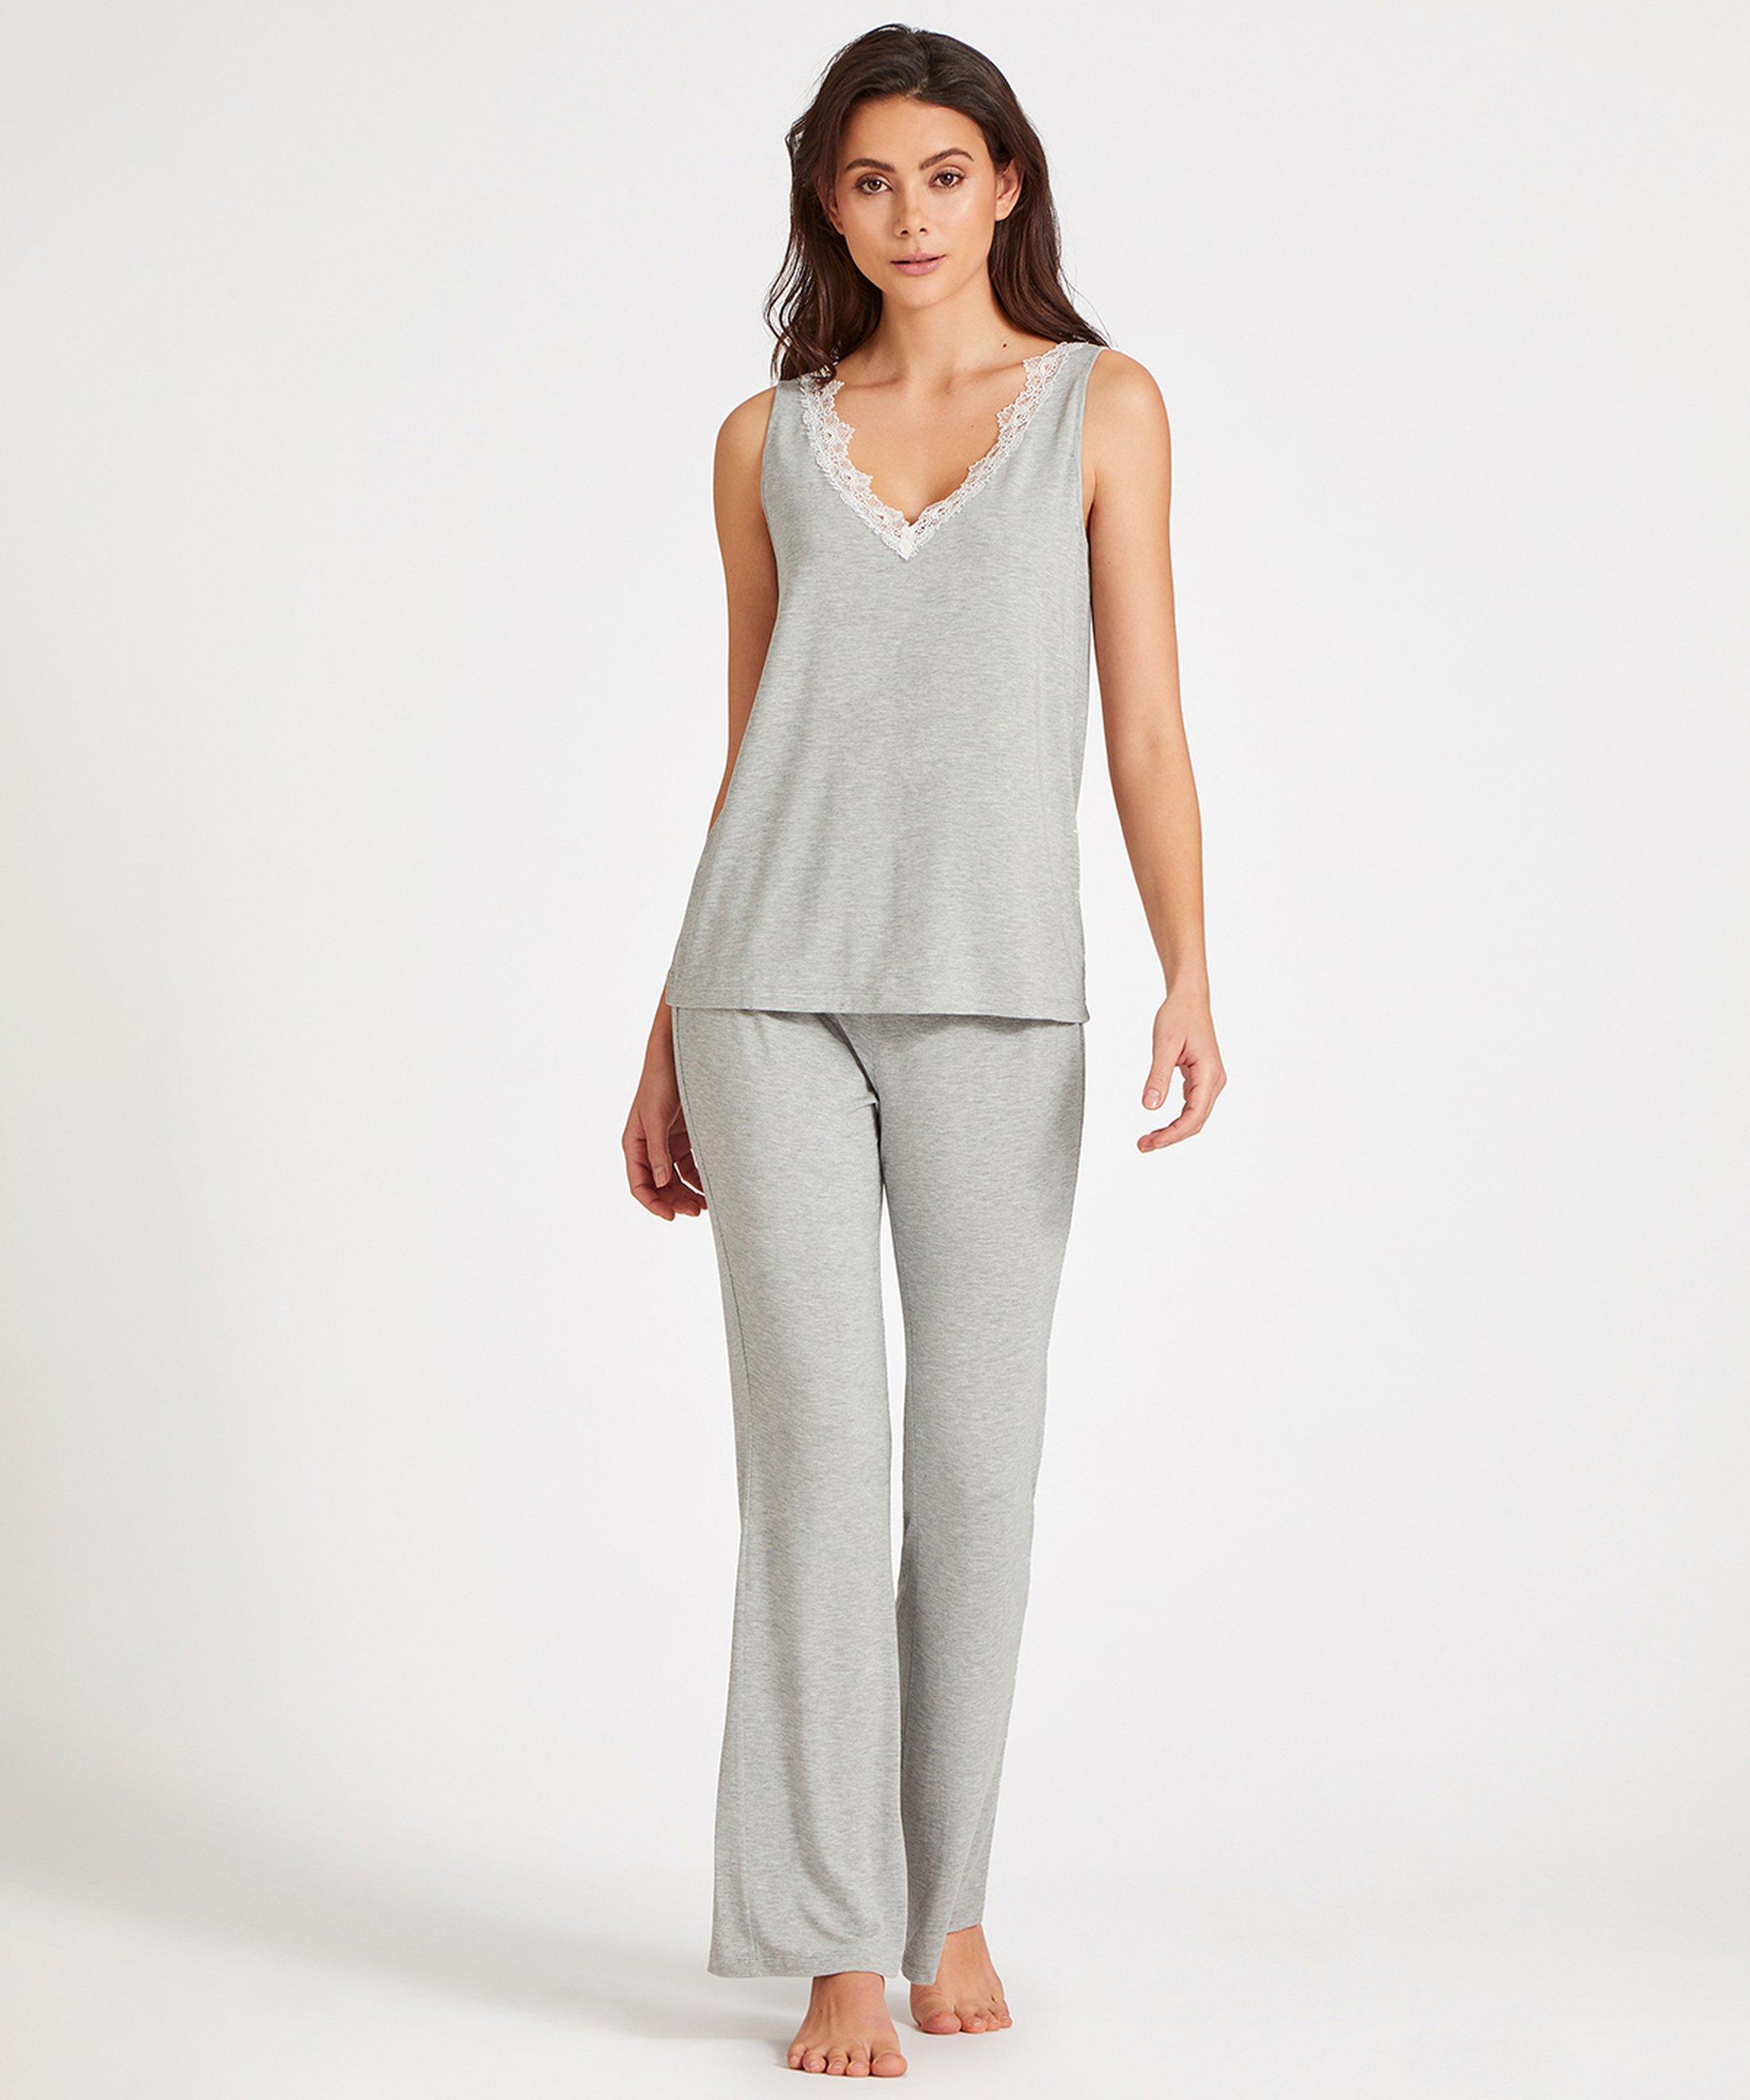 SWEET BLISS Pantalon en modal Gris Graphite | Aubade